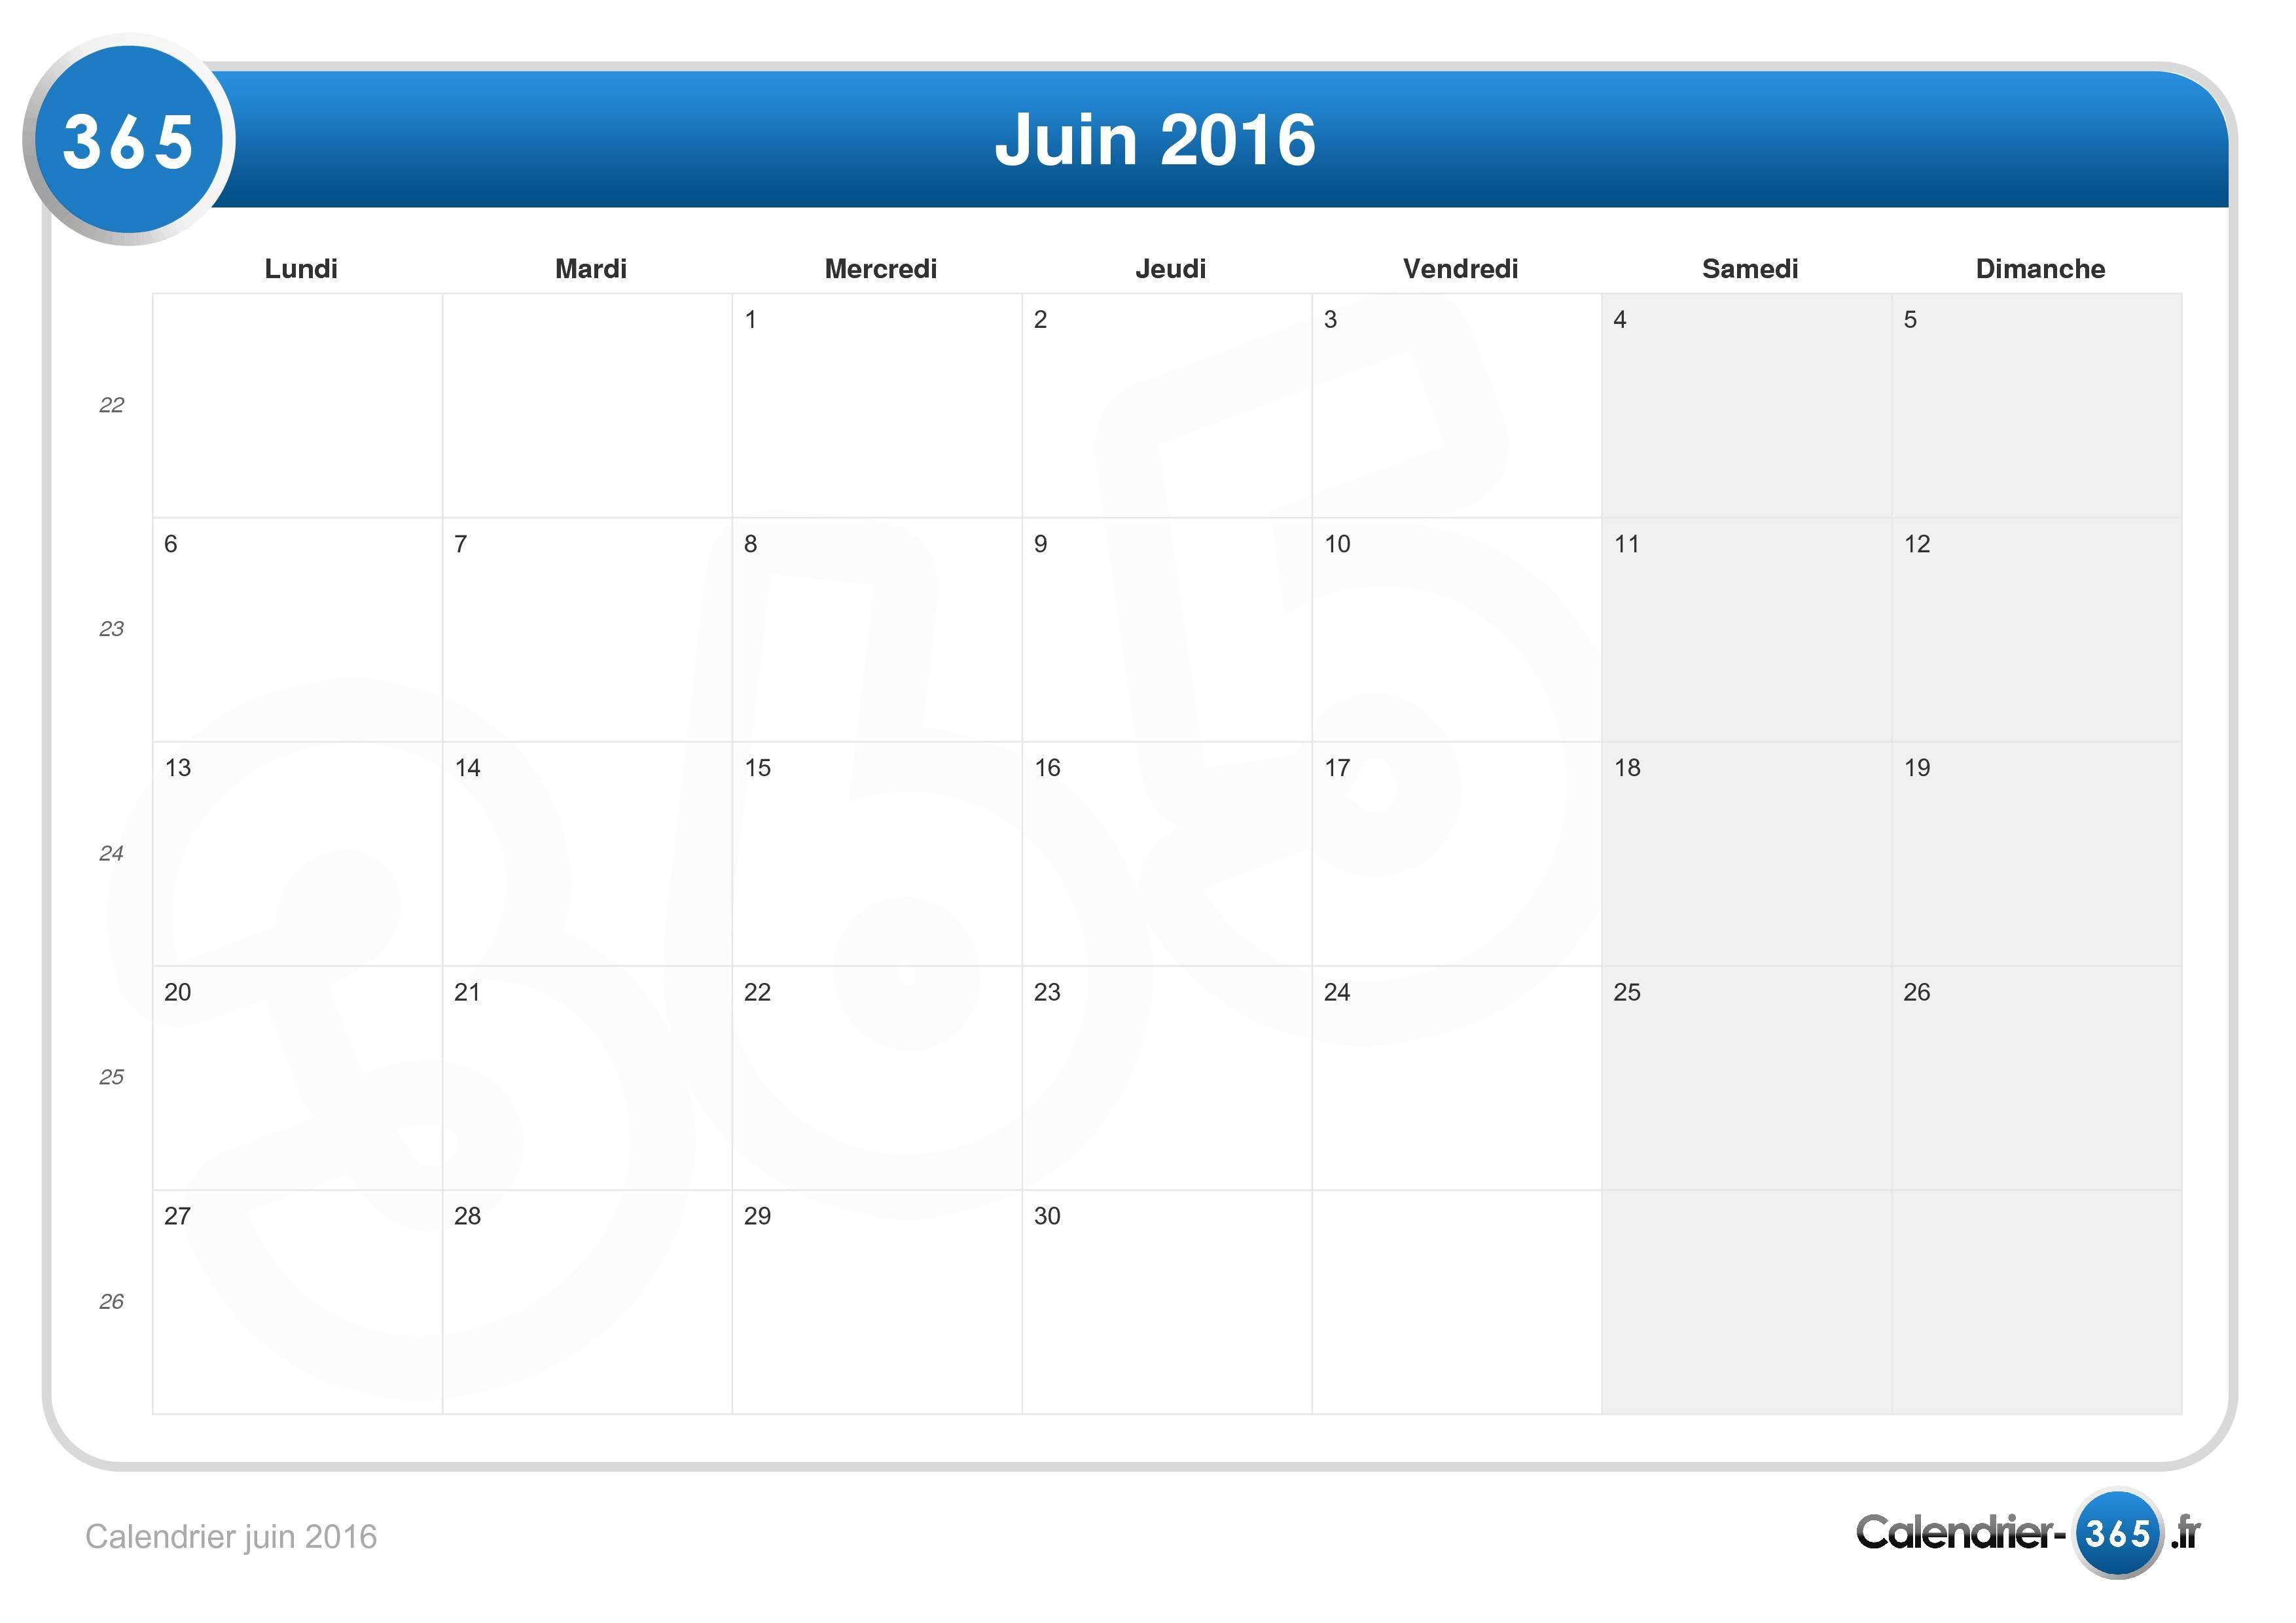 Rencontre a xv 23 juin 2016